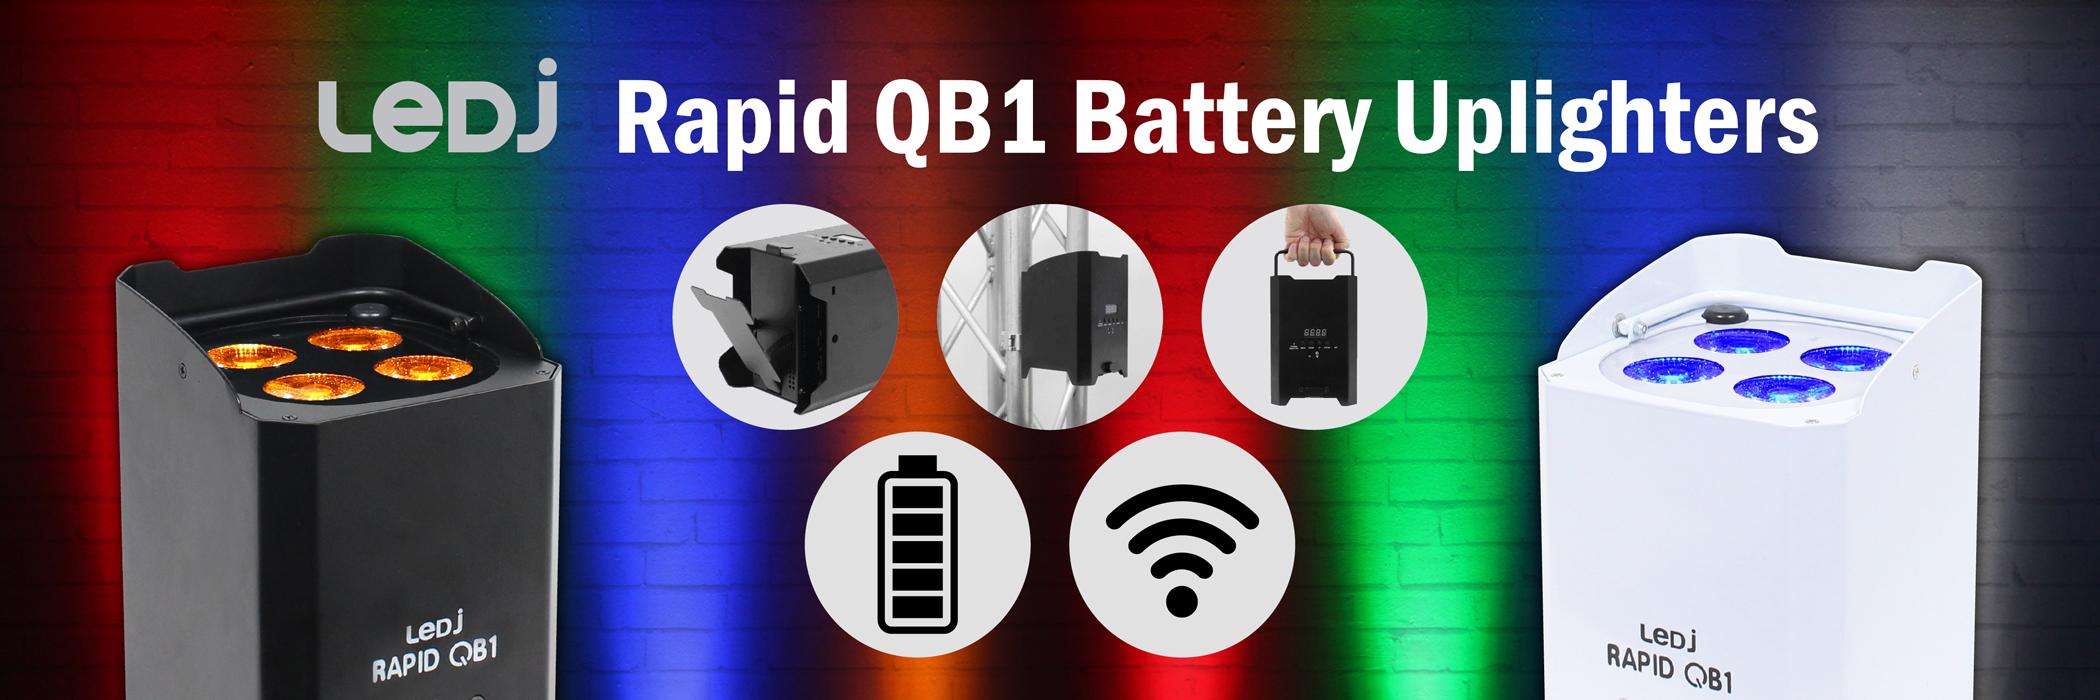 LEDJ Rapid QB1 Battery Uplighters